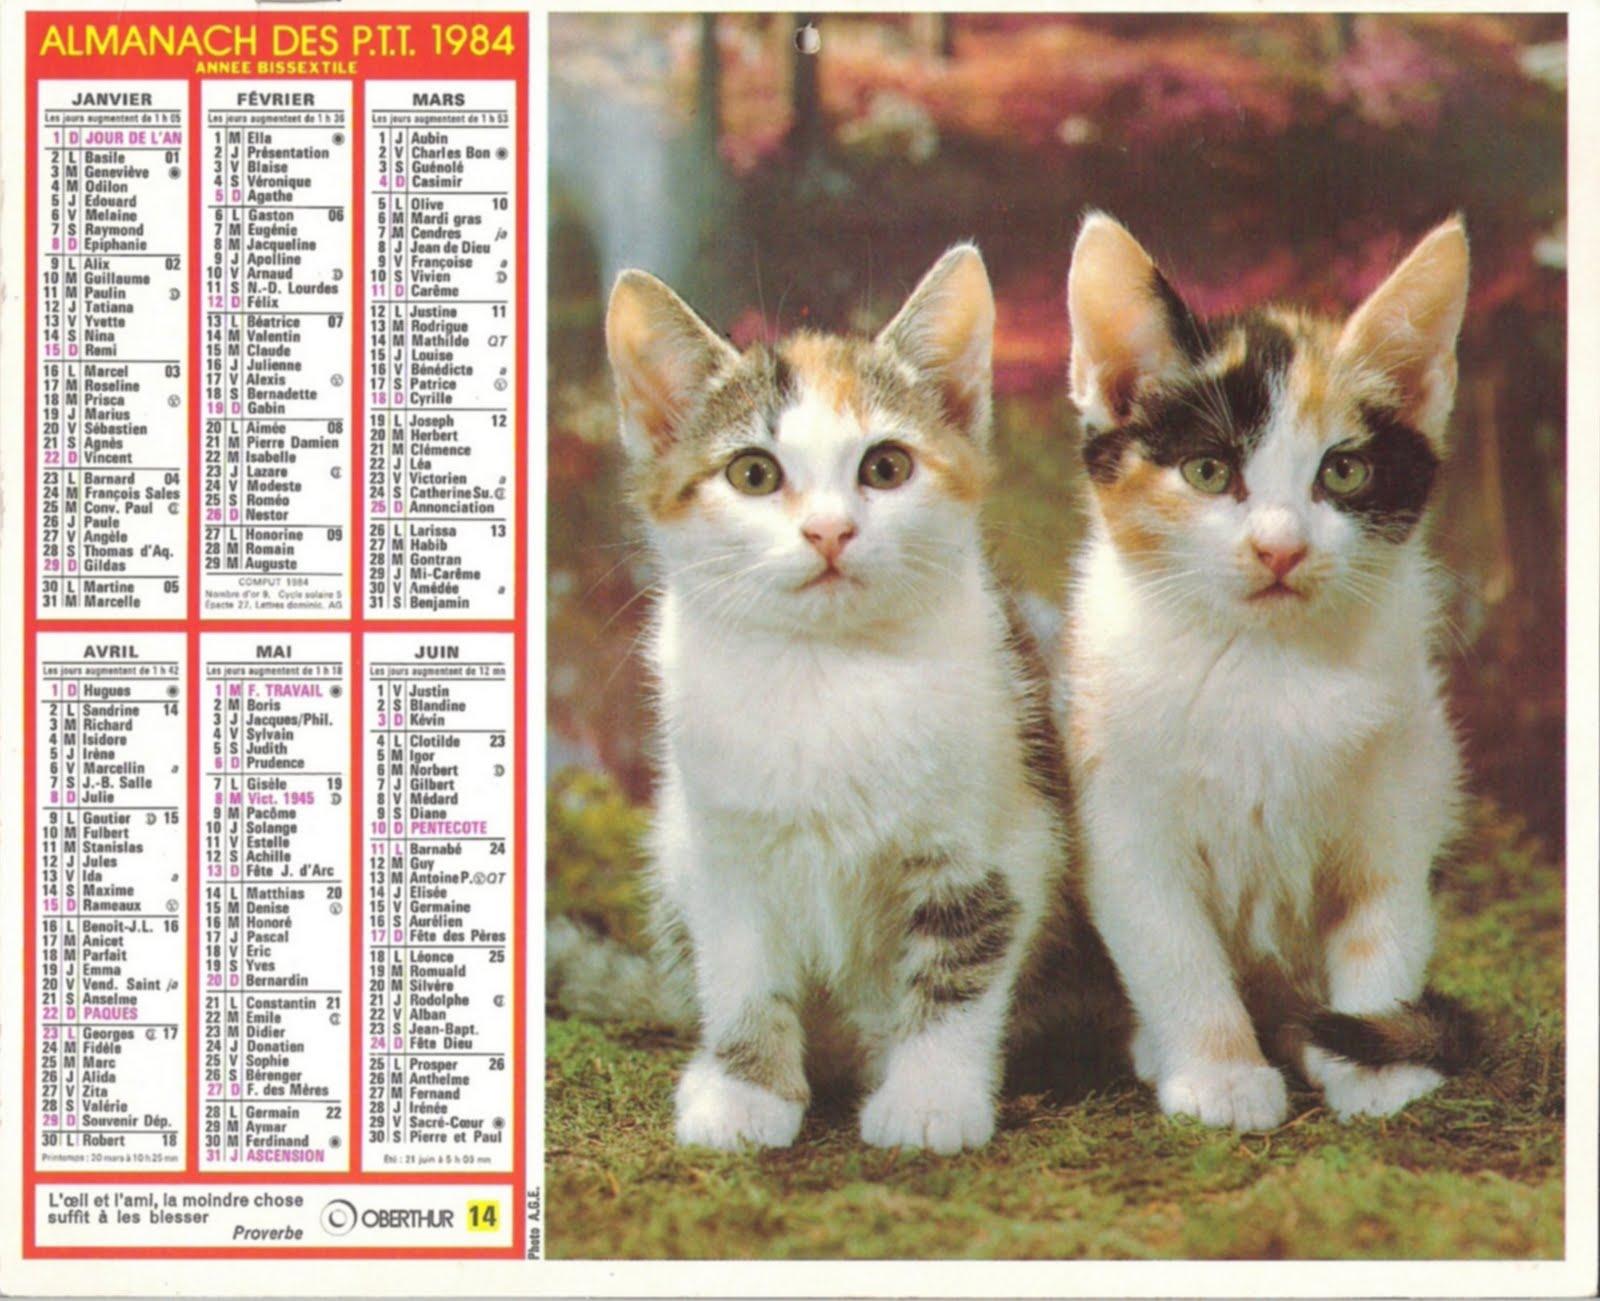 http://4.bp.blogspot.com/-19ru6qYHkLs/TevhKp1NUKI/AAAAAAAAC2M/XZLBRIDULjY/s1600/Almanach_0020_1984.jpg